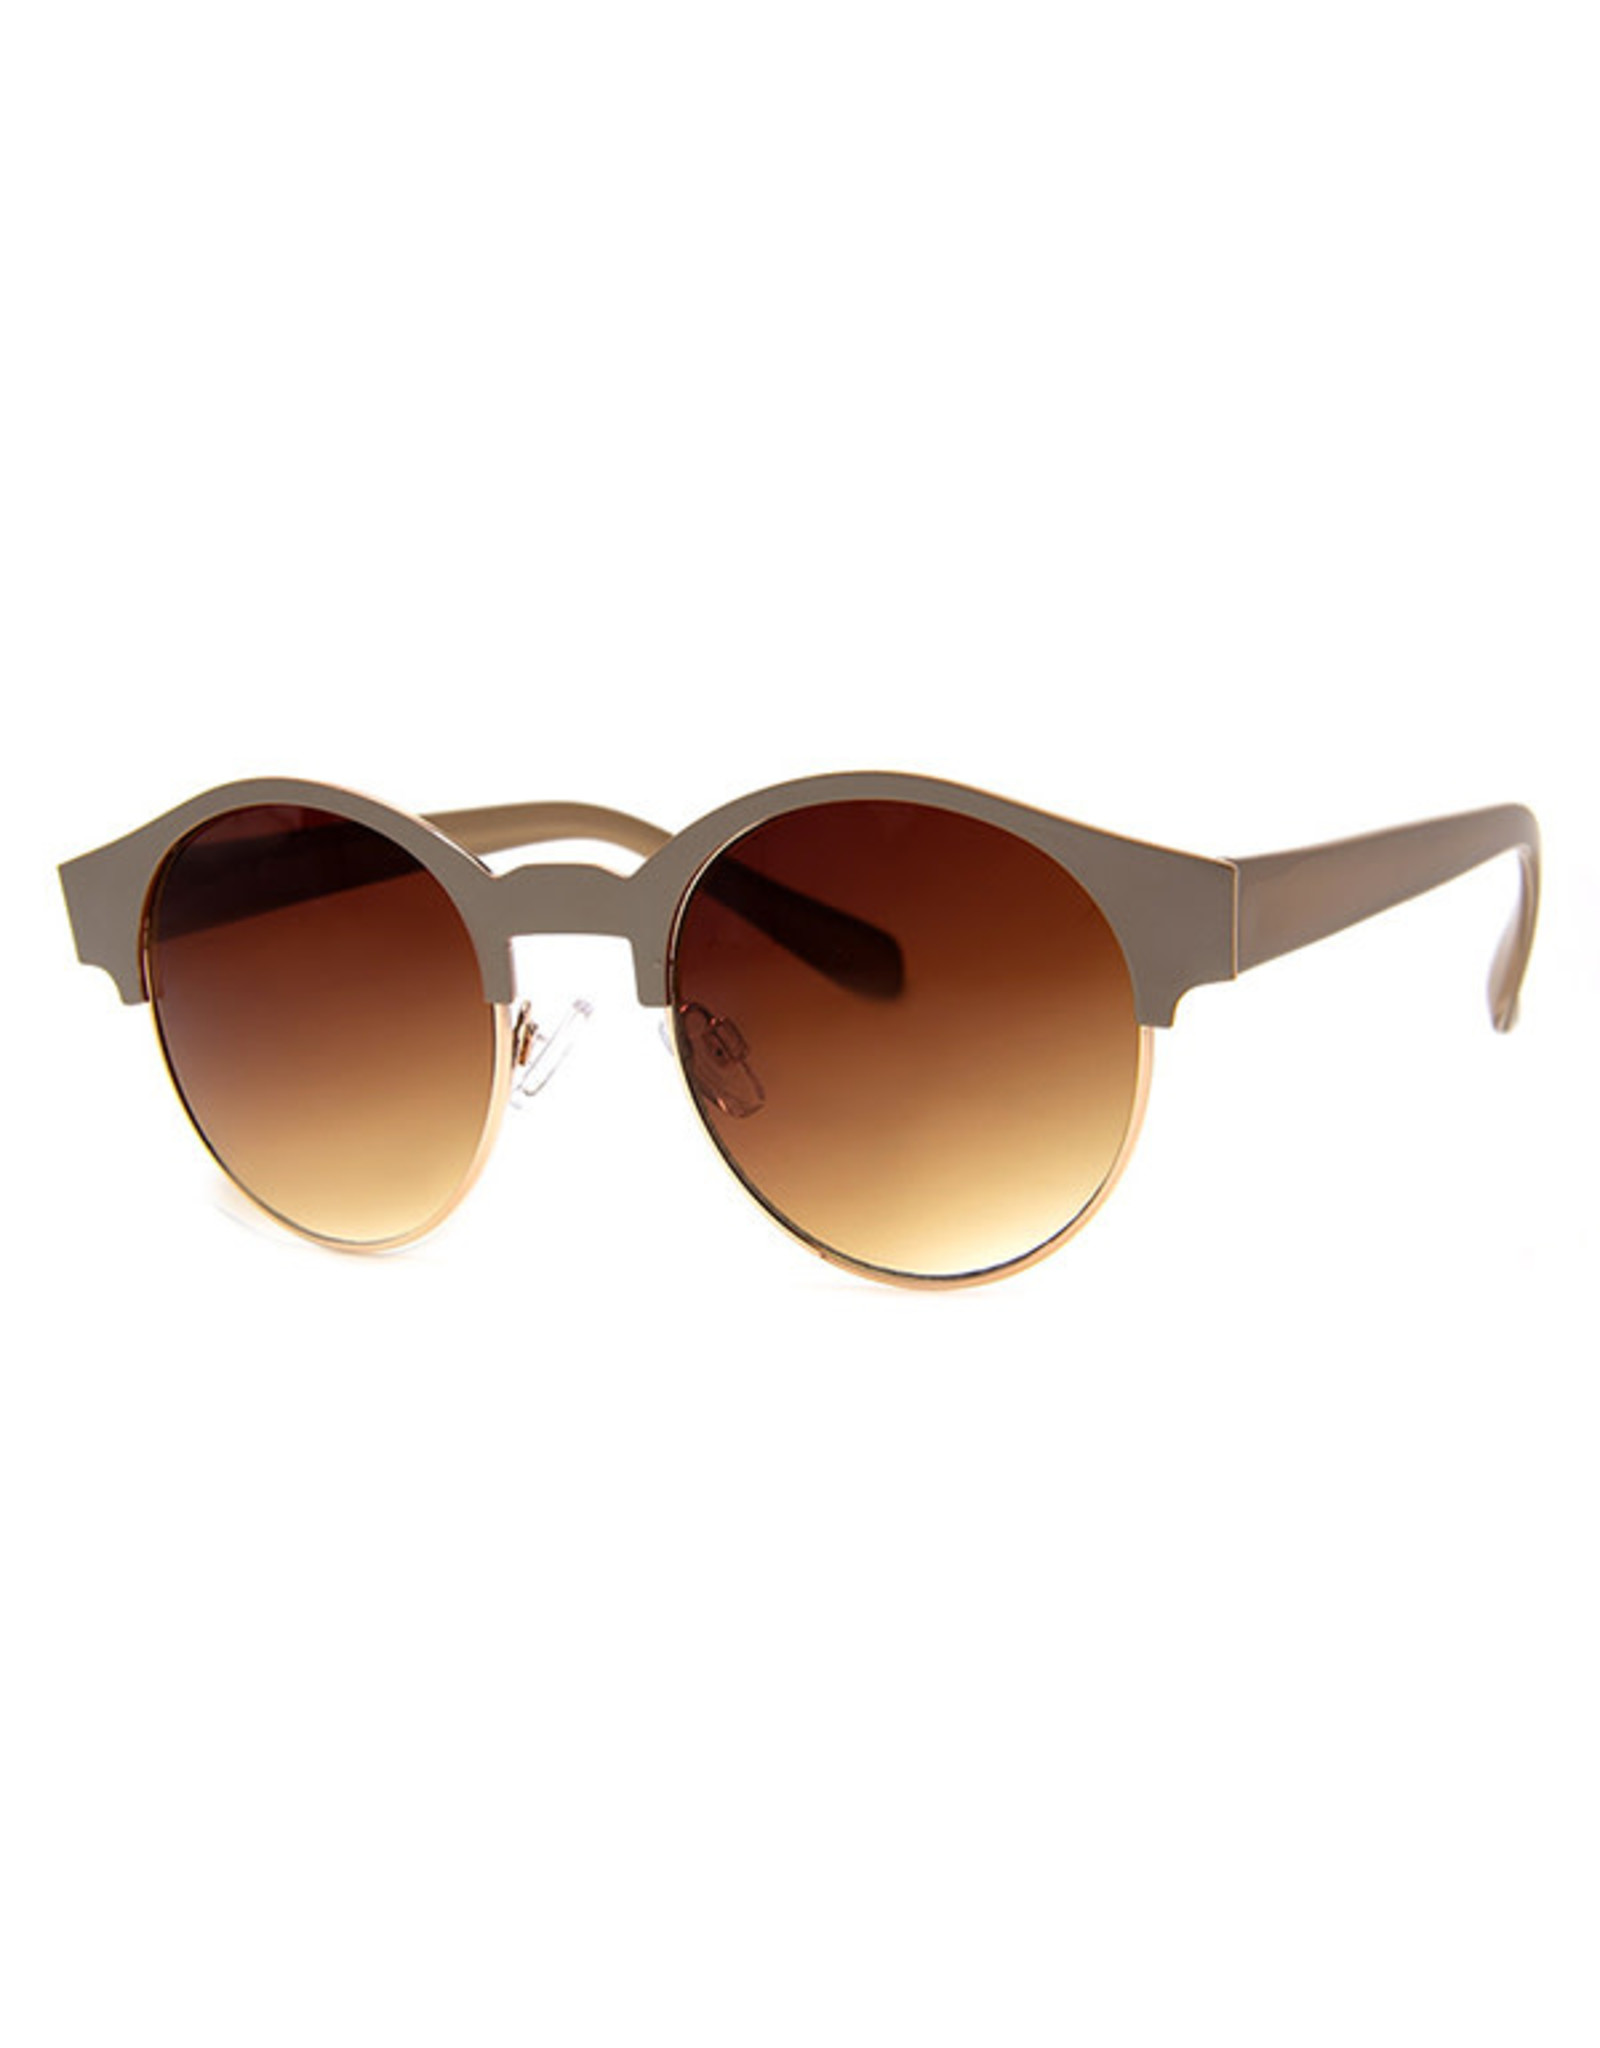 AJ Morgan AJM - Round Half-Colored Frame Sunglasses